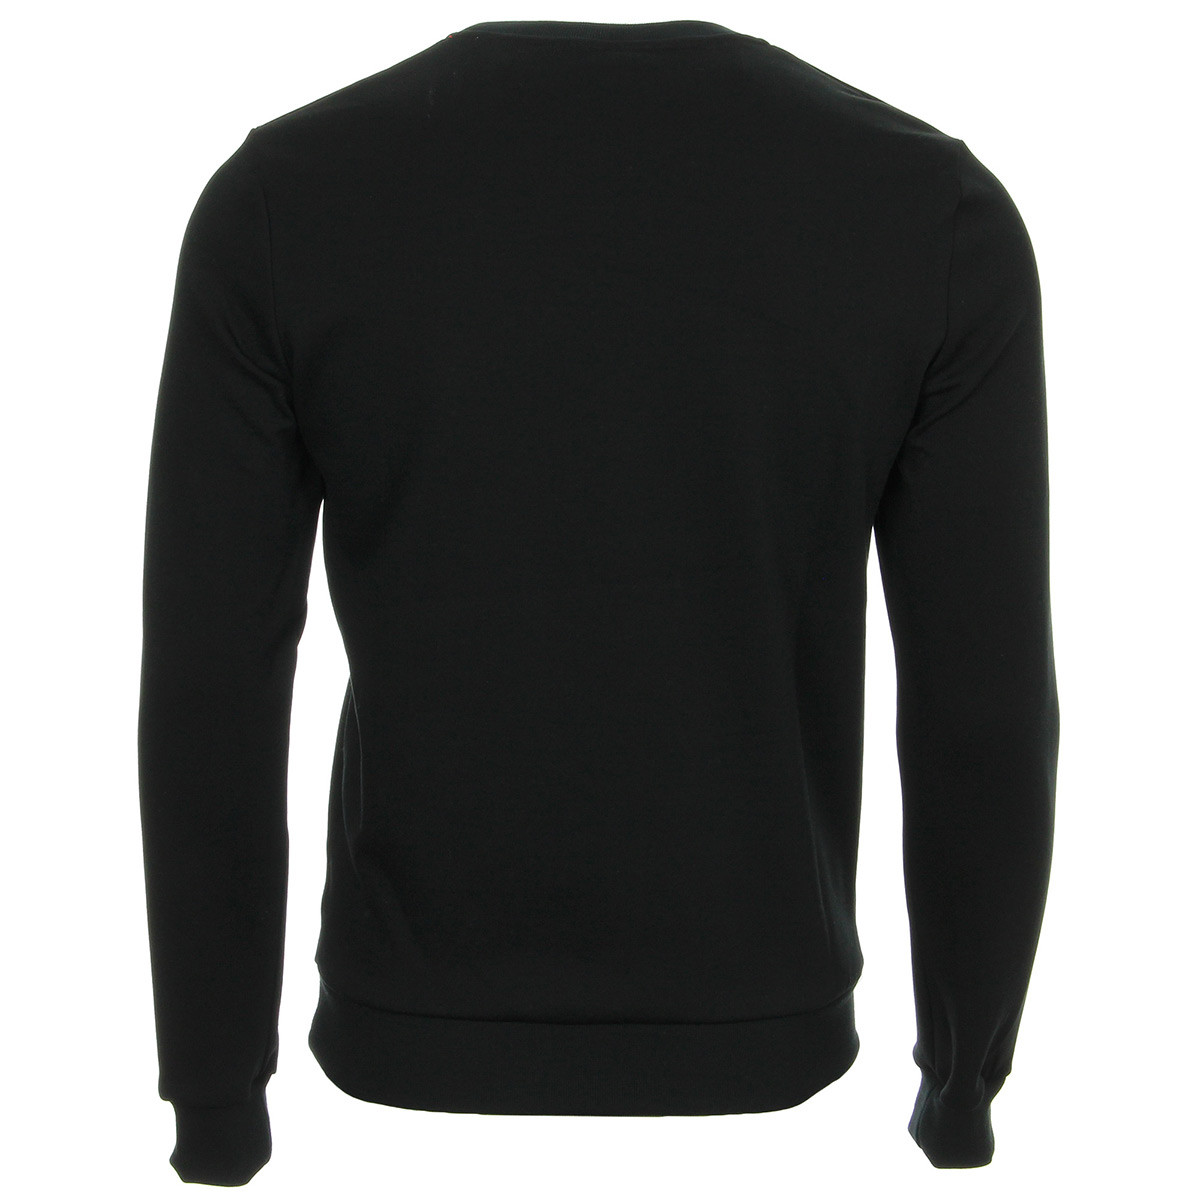 Le Coq Sportif Ess Sp Crew Sweat N°3 M Black 1720319, Sweats homme